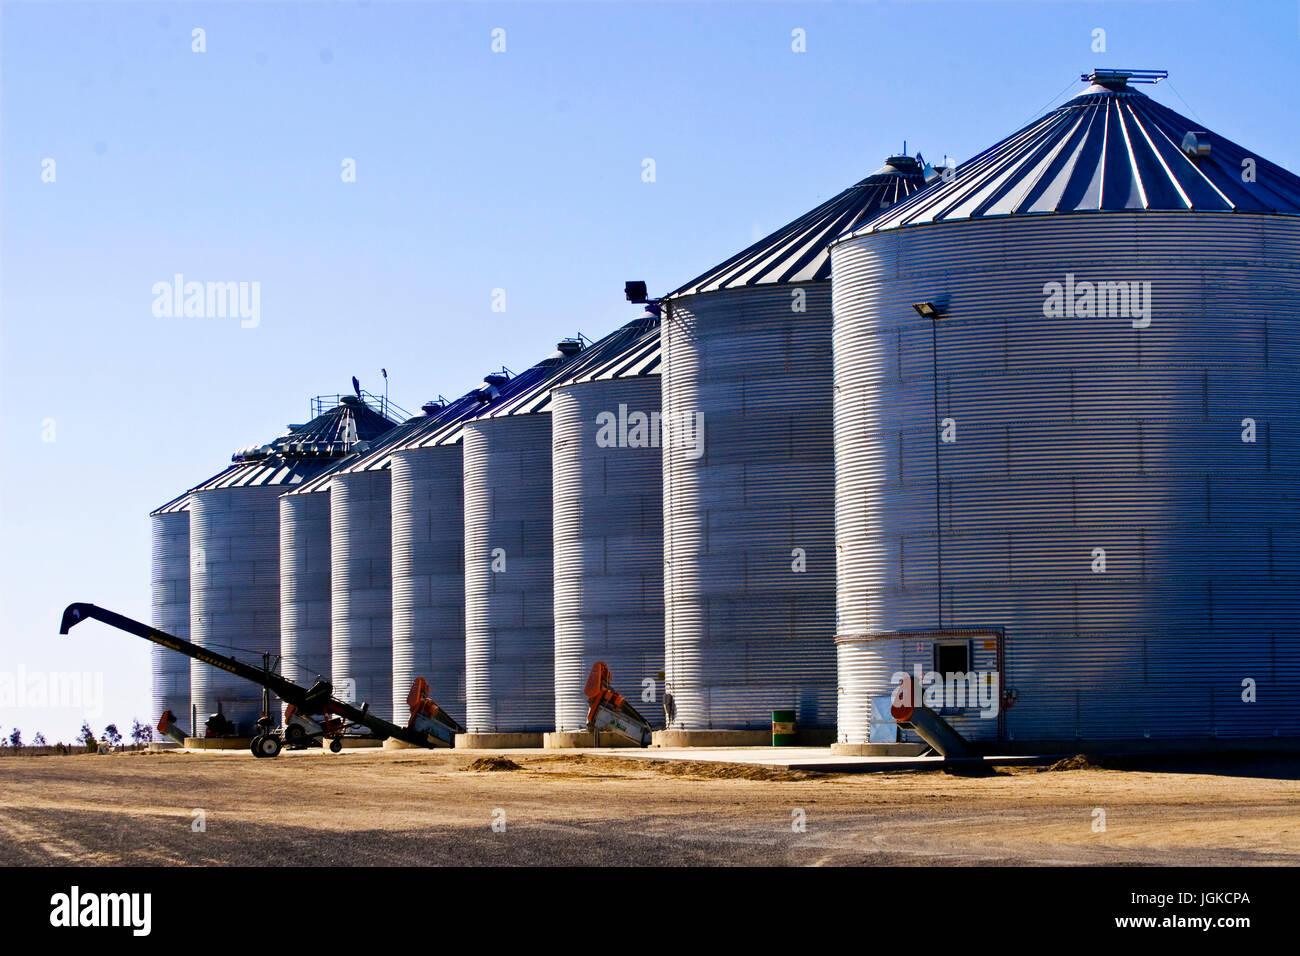 Steel grain silos in Australia Stock Photo